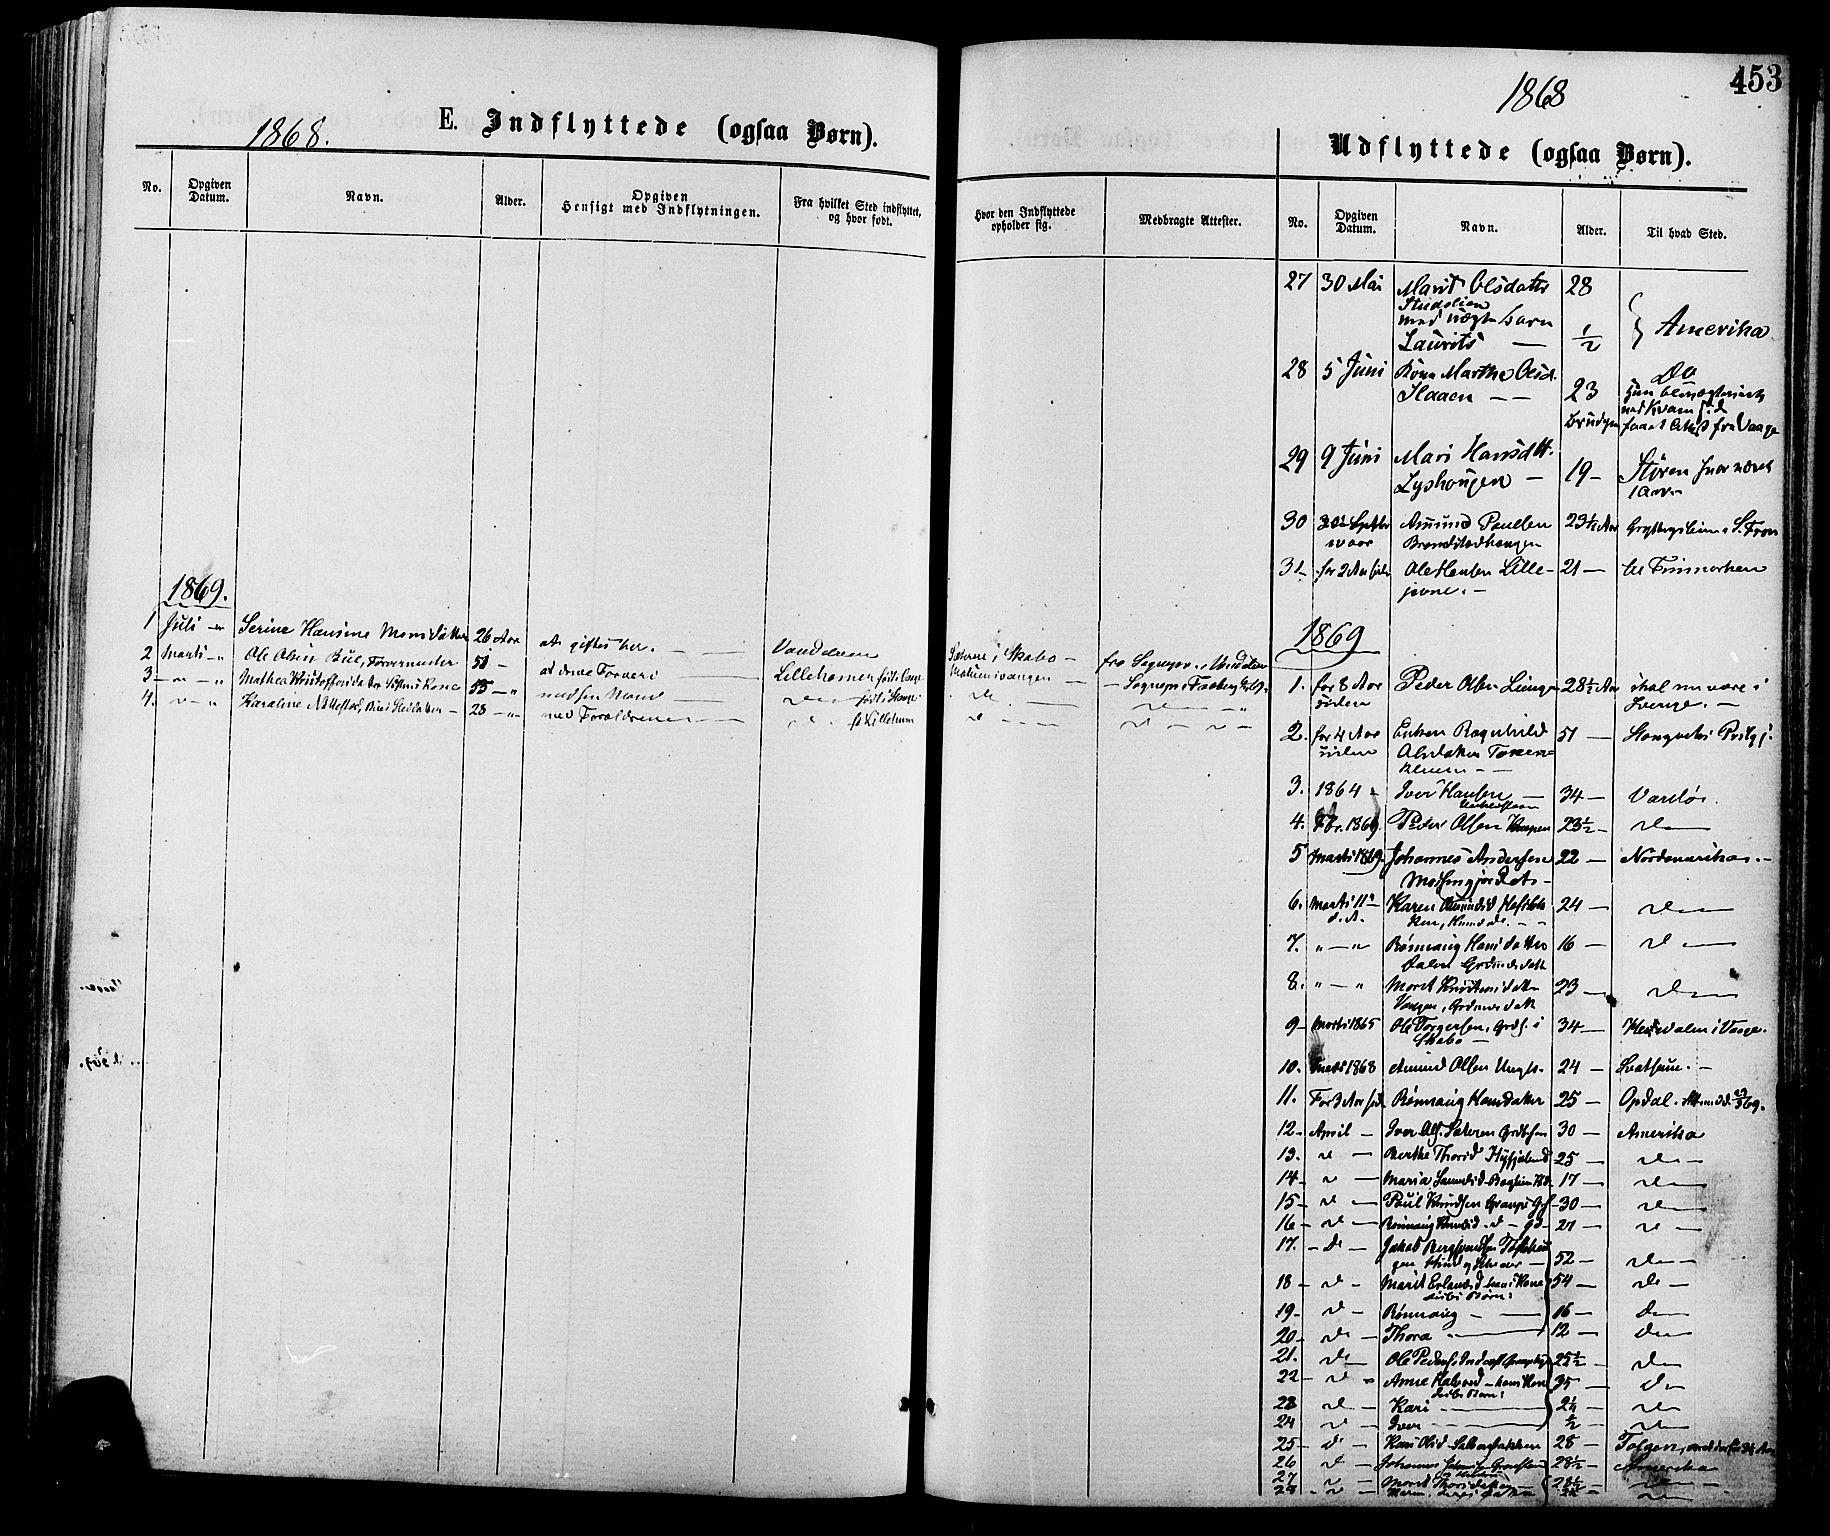 SAH, Nord-Fron prestekontor, Ministerialbok nr. 2, 1865-1883, s. 453